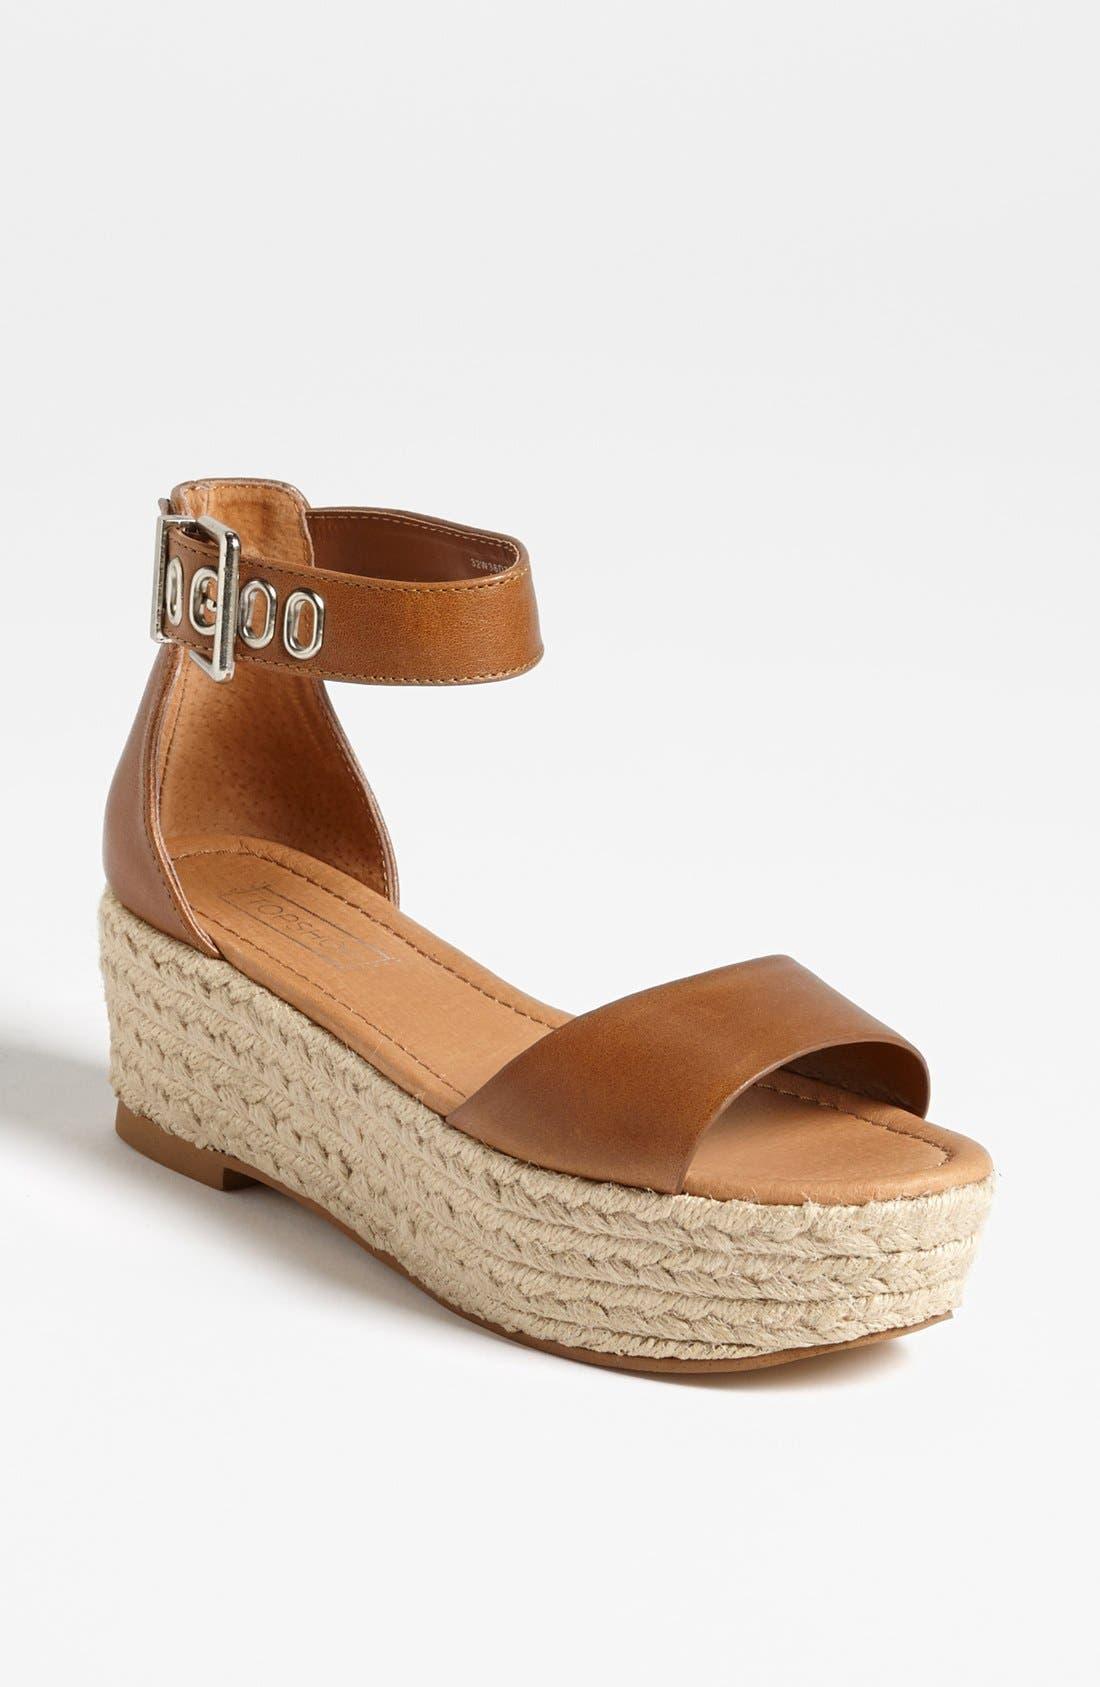 Main Image - Topshop 'Woohoo' Sandal